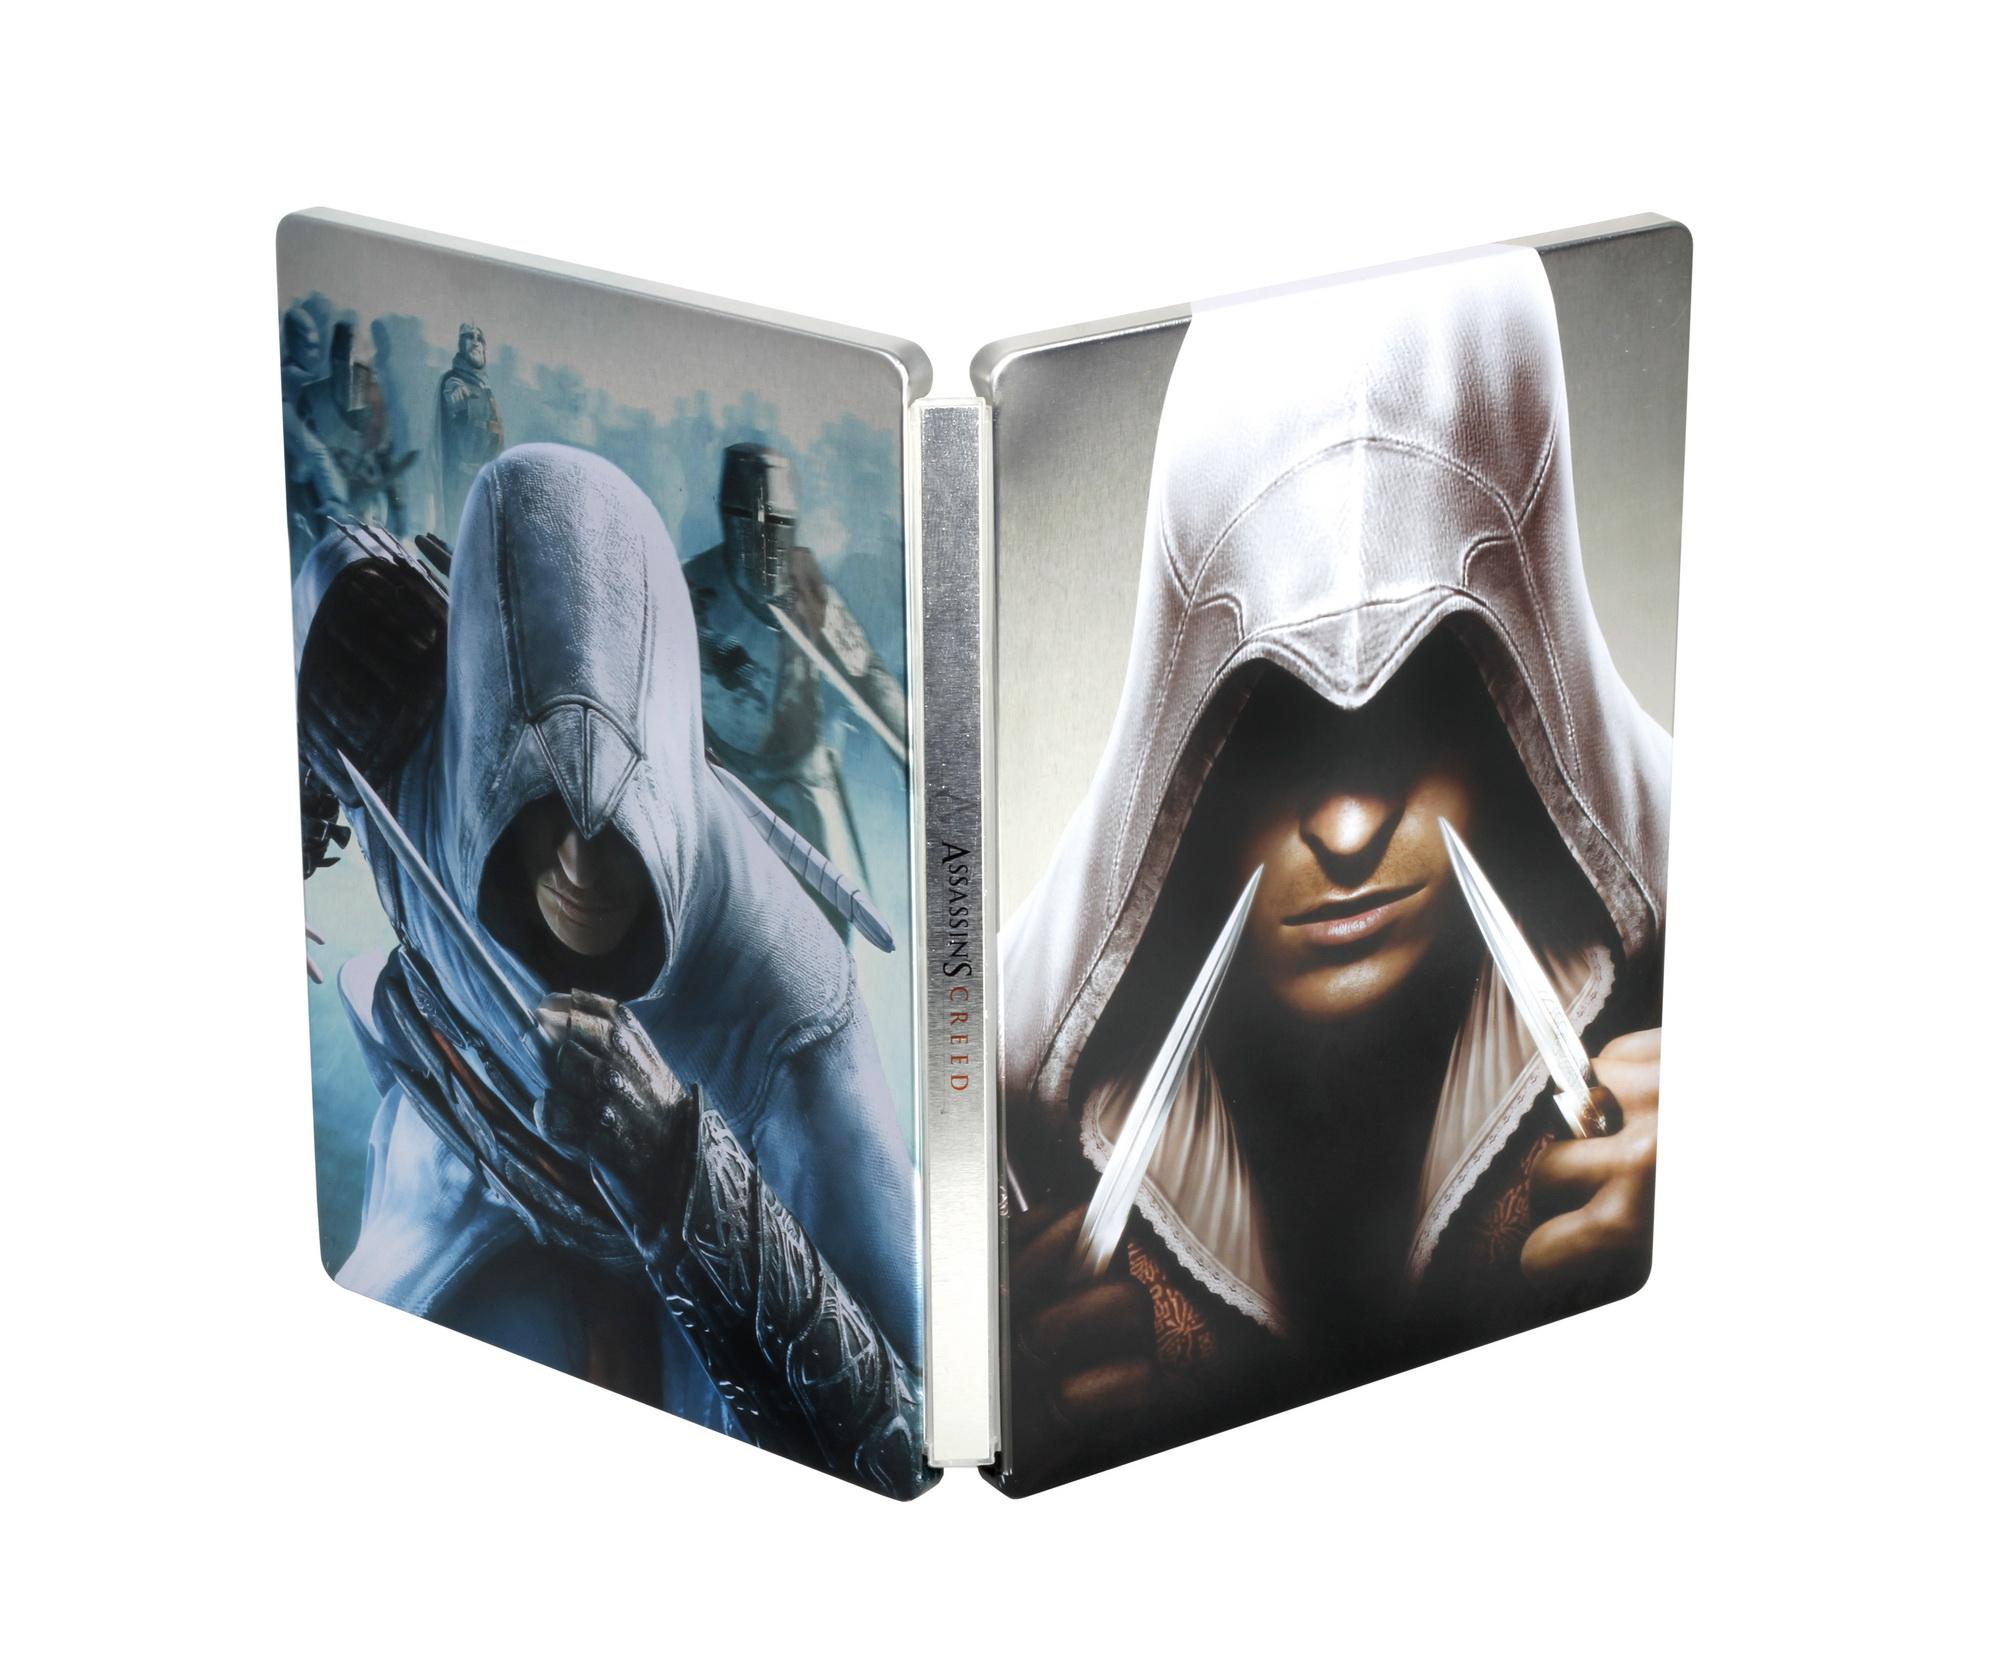 Assassin Creed Serie Steelbook